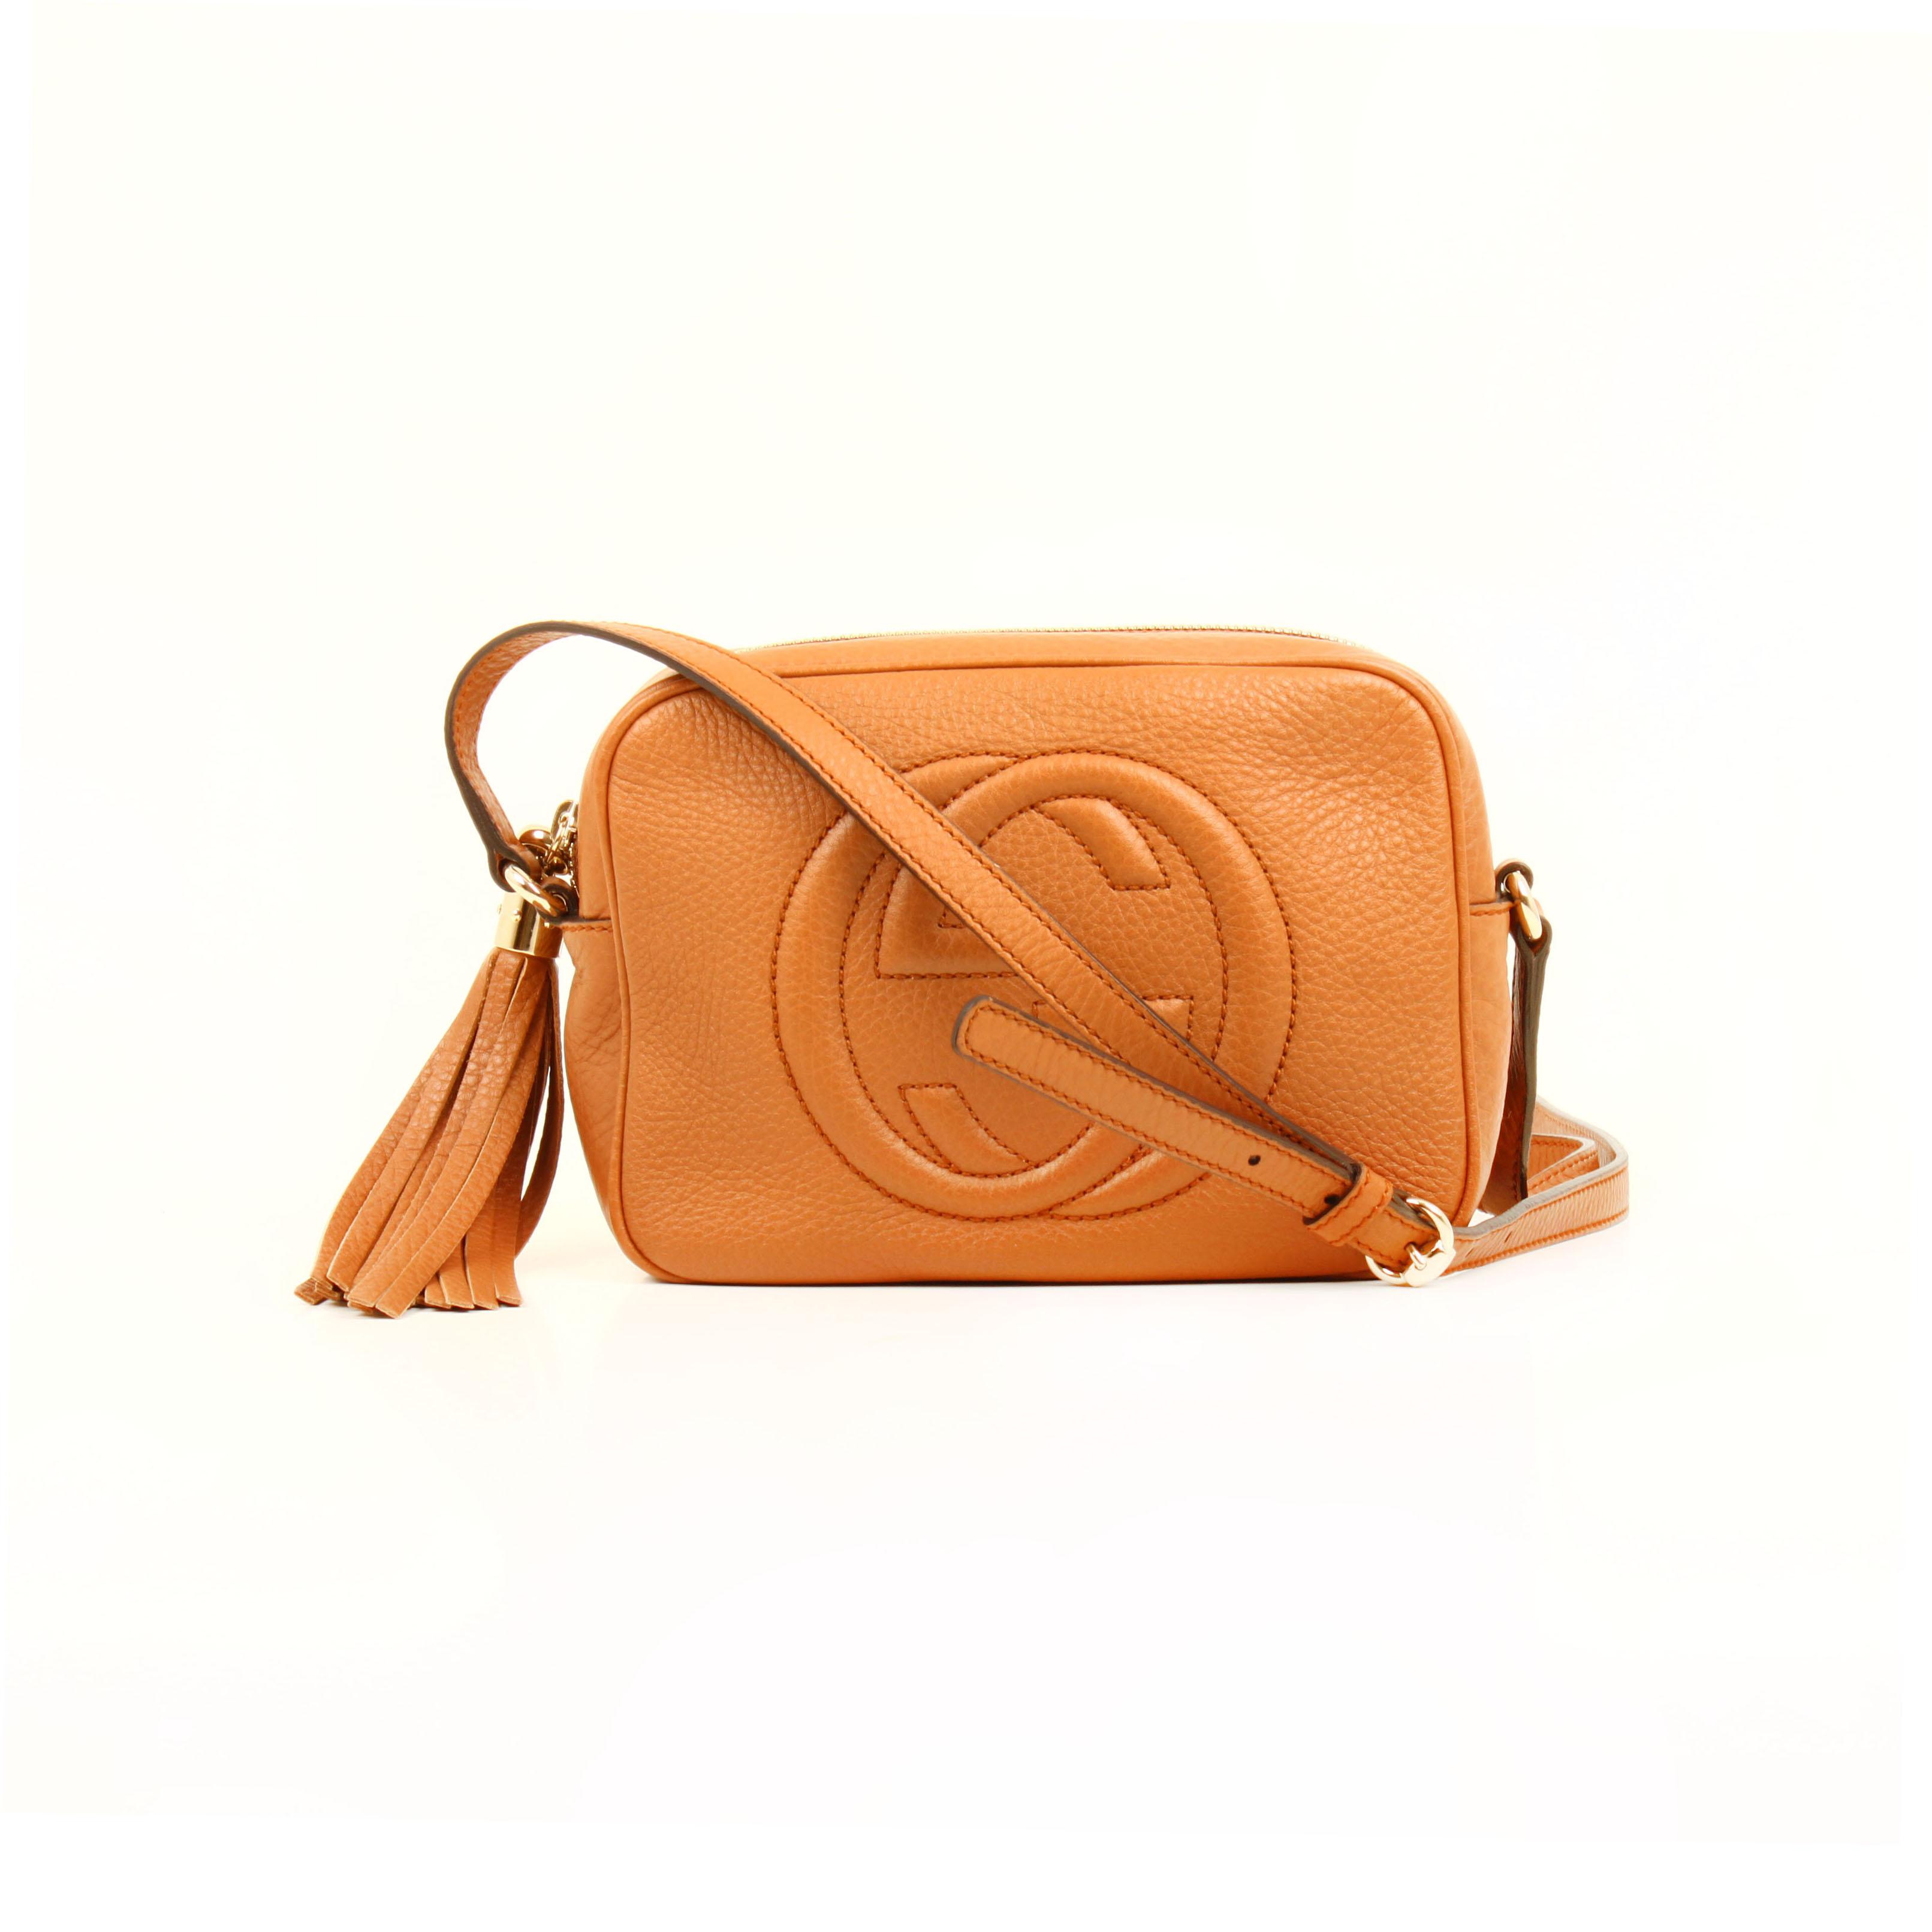 gucci soho disco bag leather maple brown crossbody